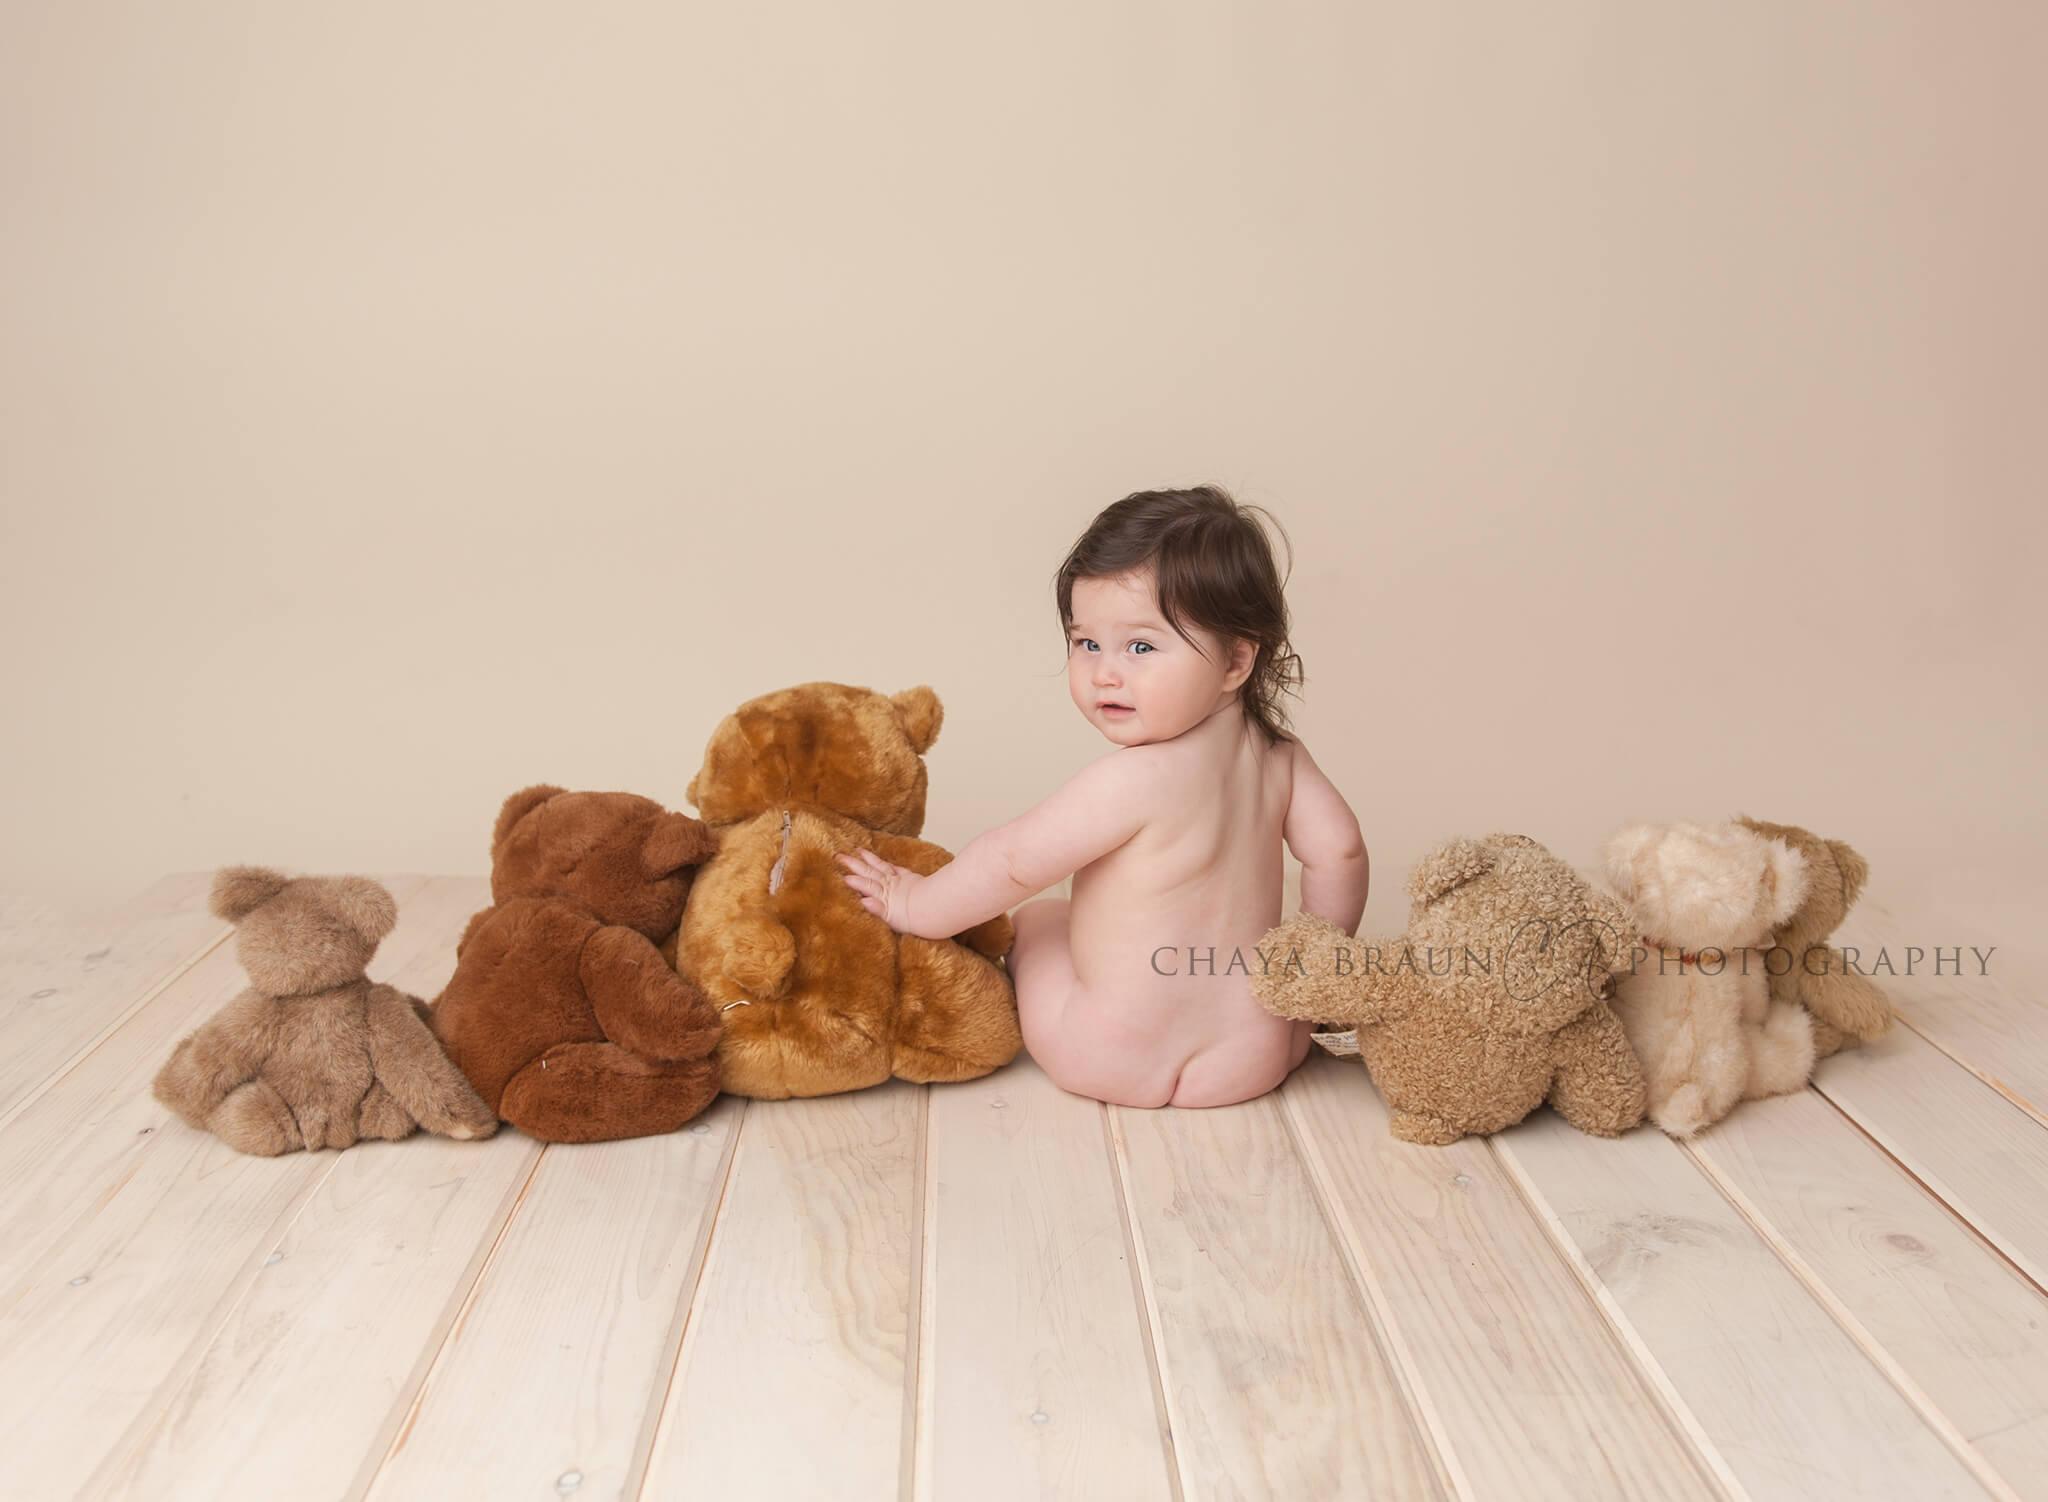 baby sitting backwards with teddy bears